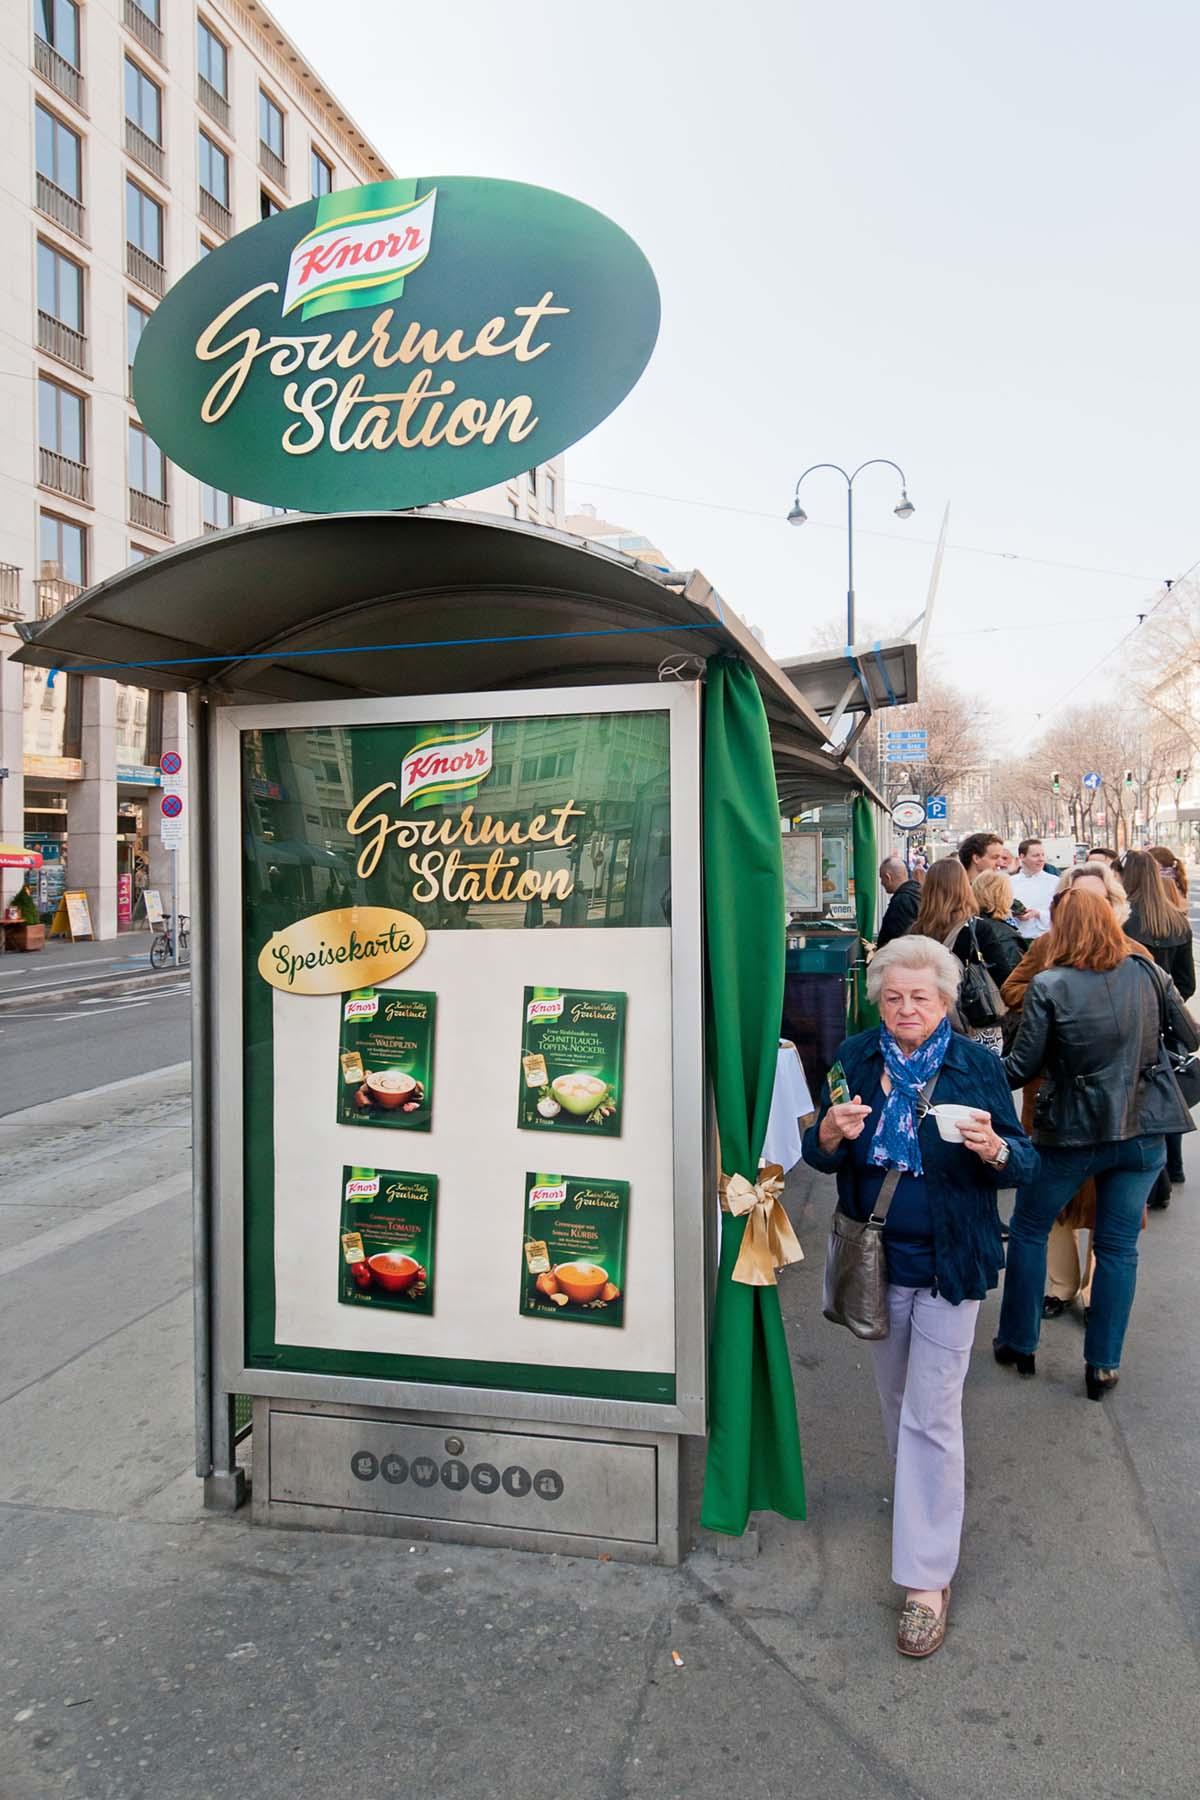 KNorr Gourmet Station Guerilla Marketing Division4 Wien Alex Zoubek